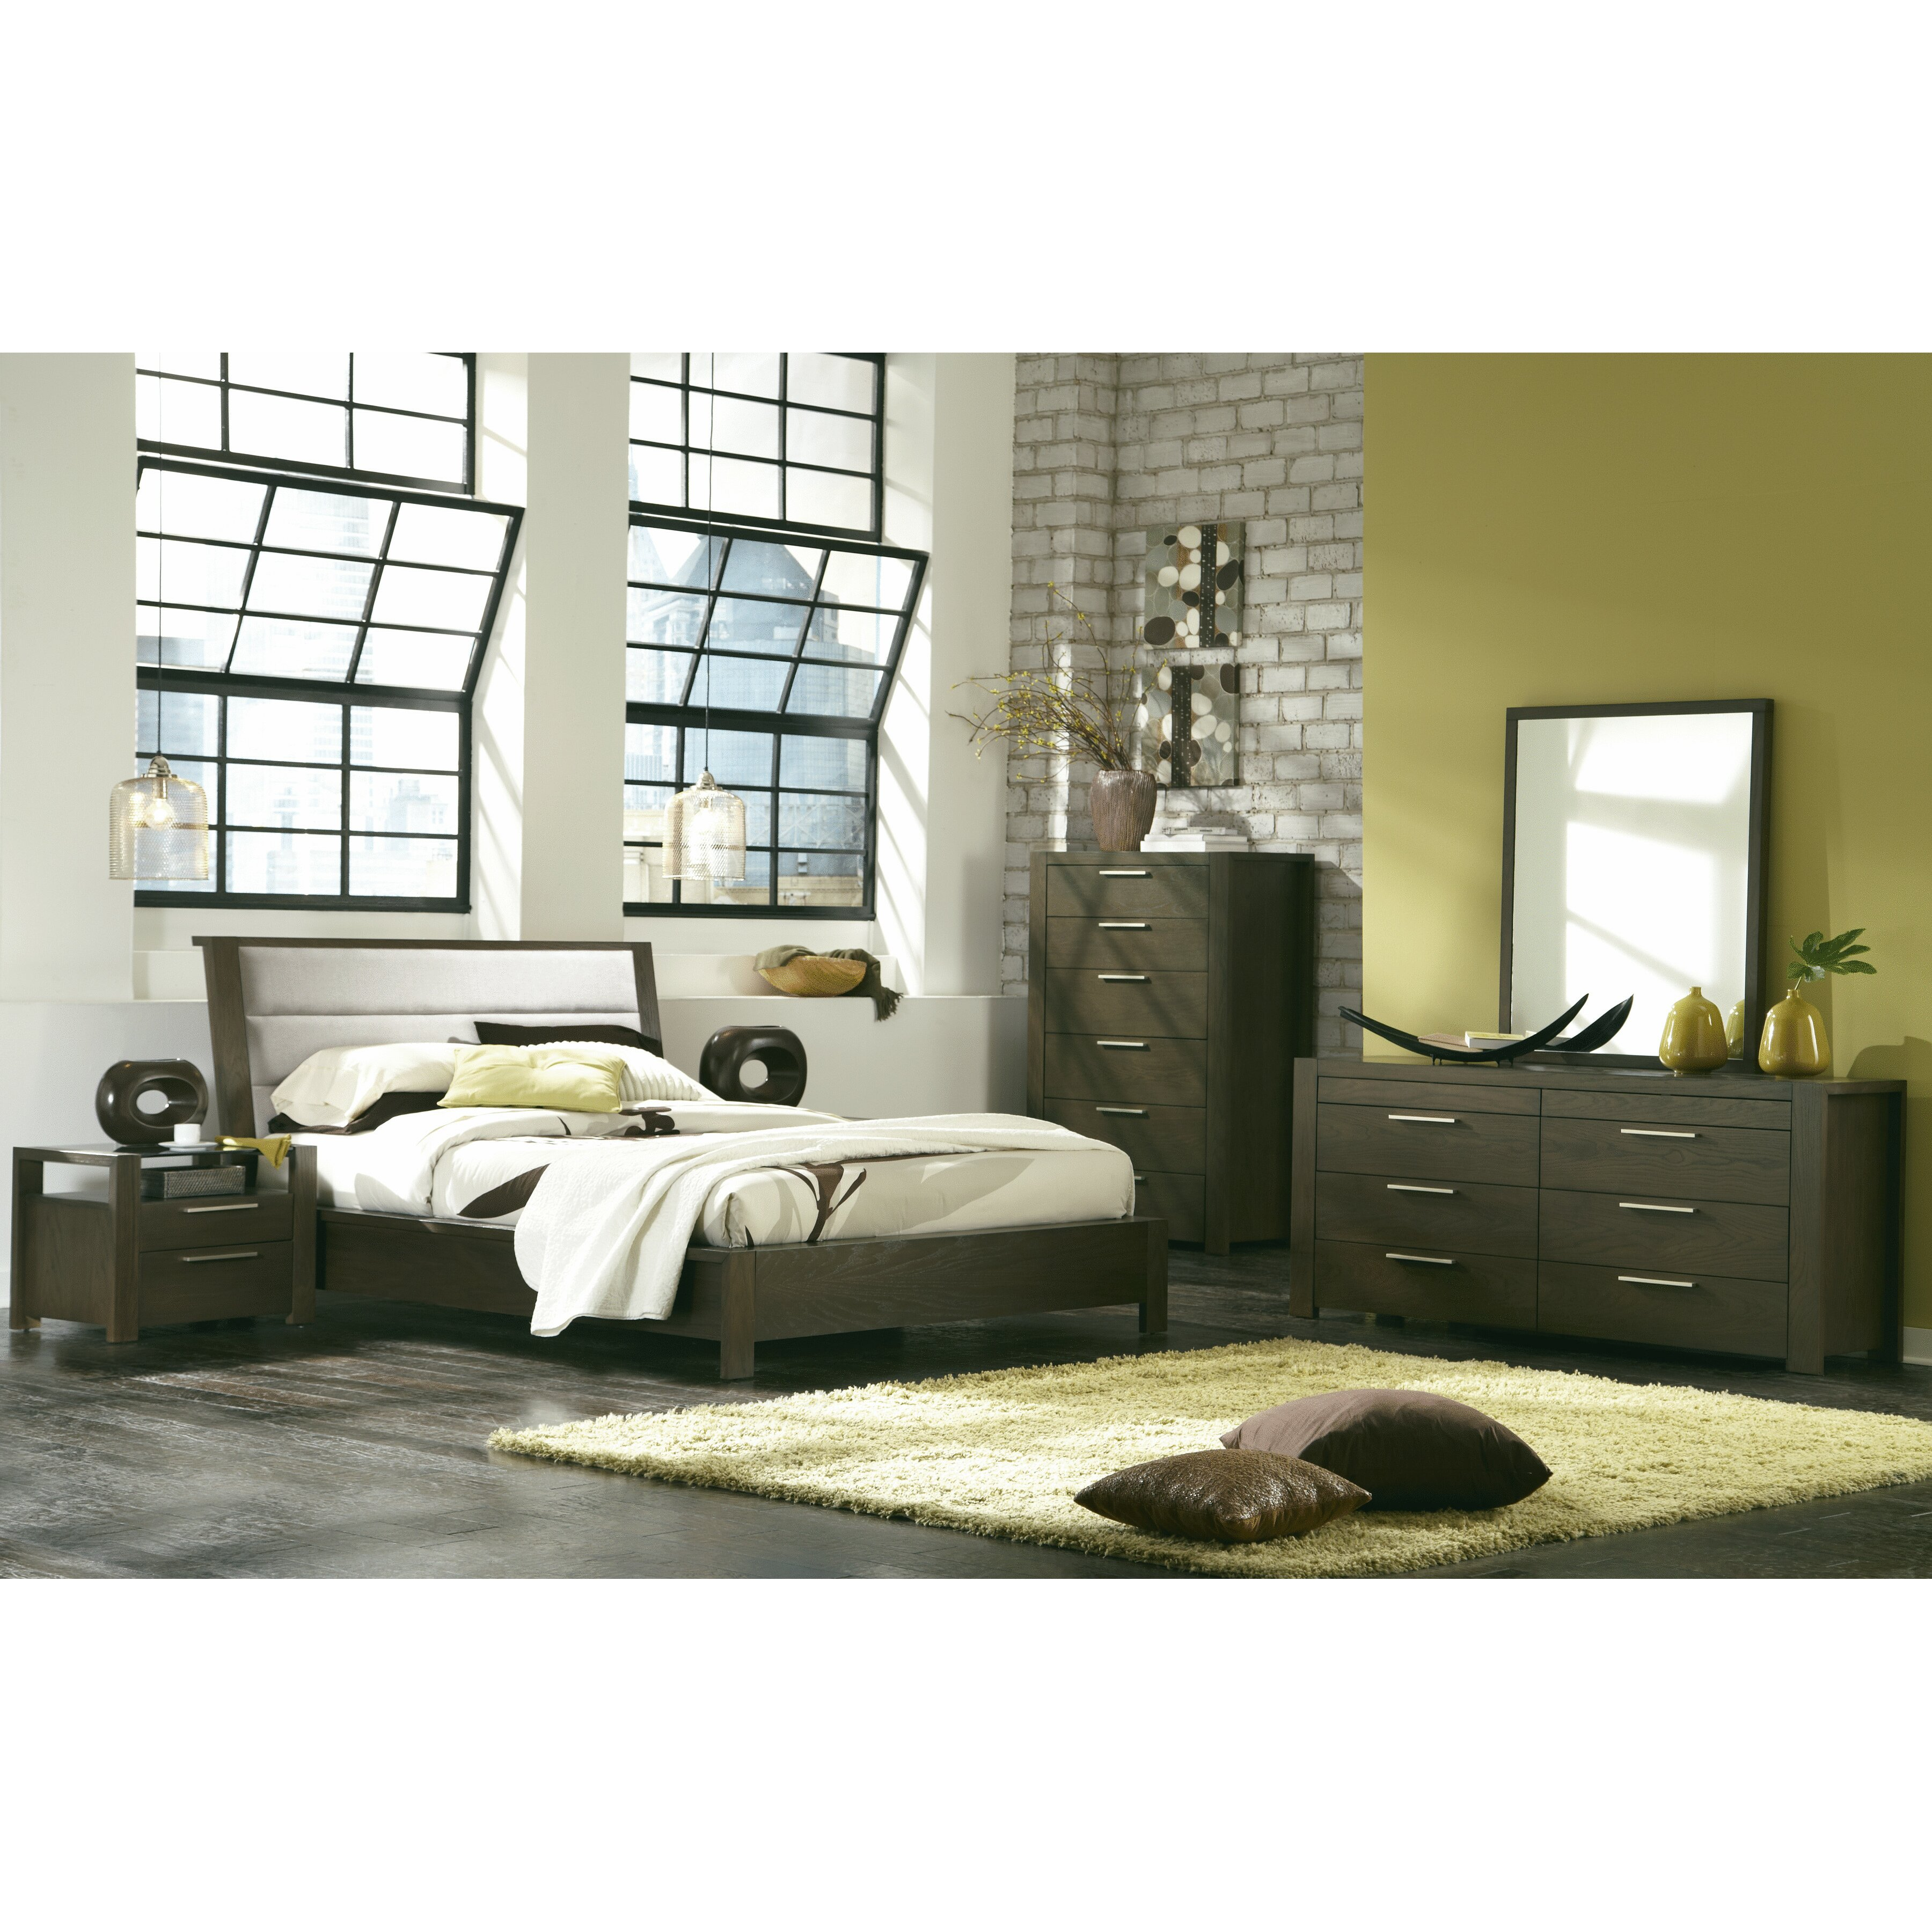 Casana Furniture Company Hudson 6 Drawer Chest